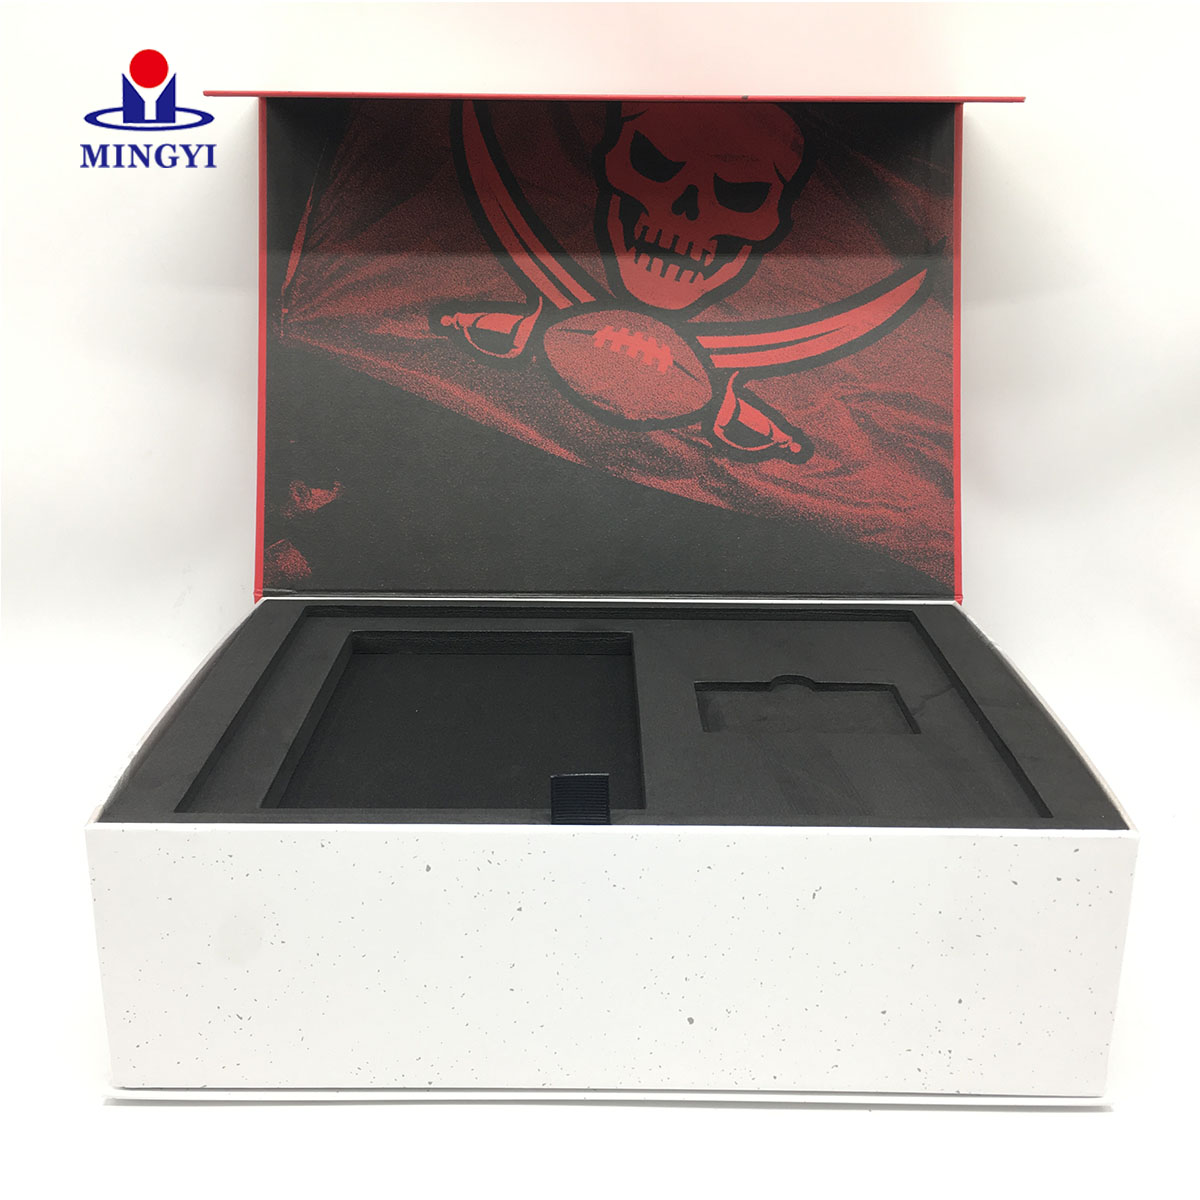 Mingyi Printing Array image93